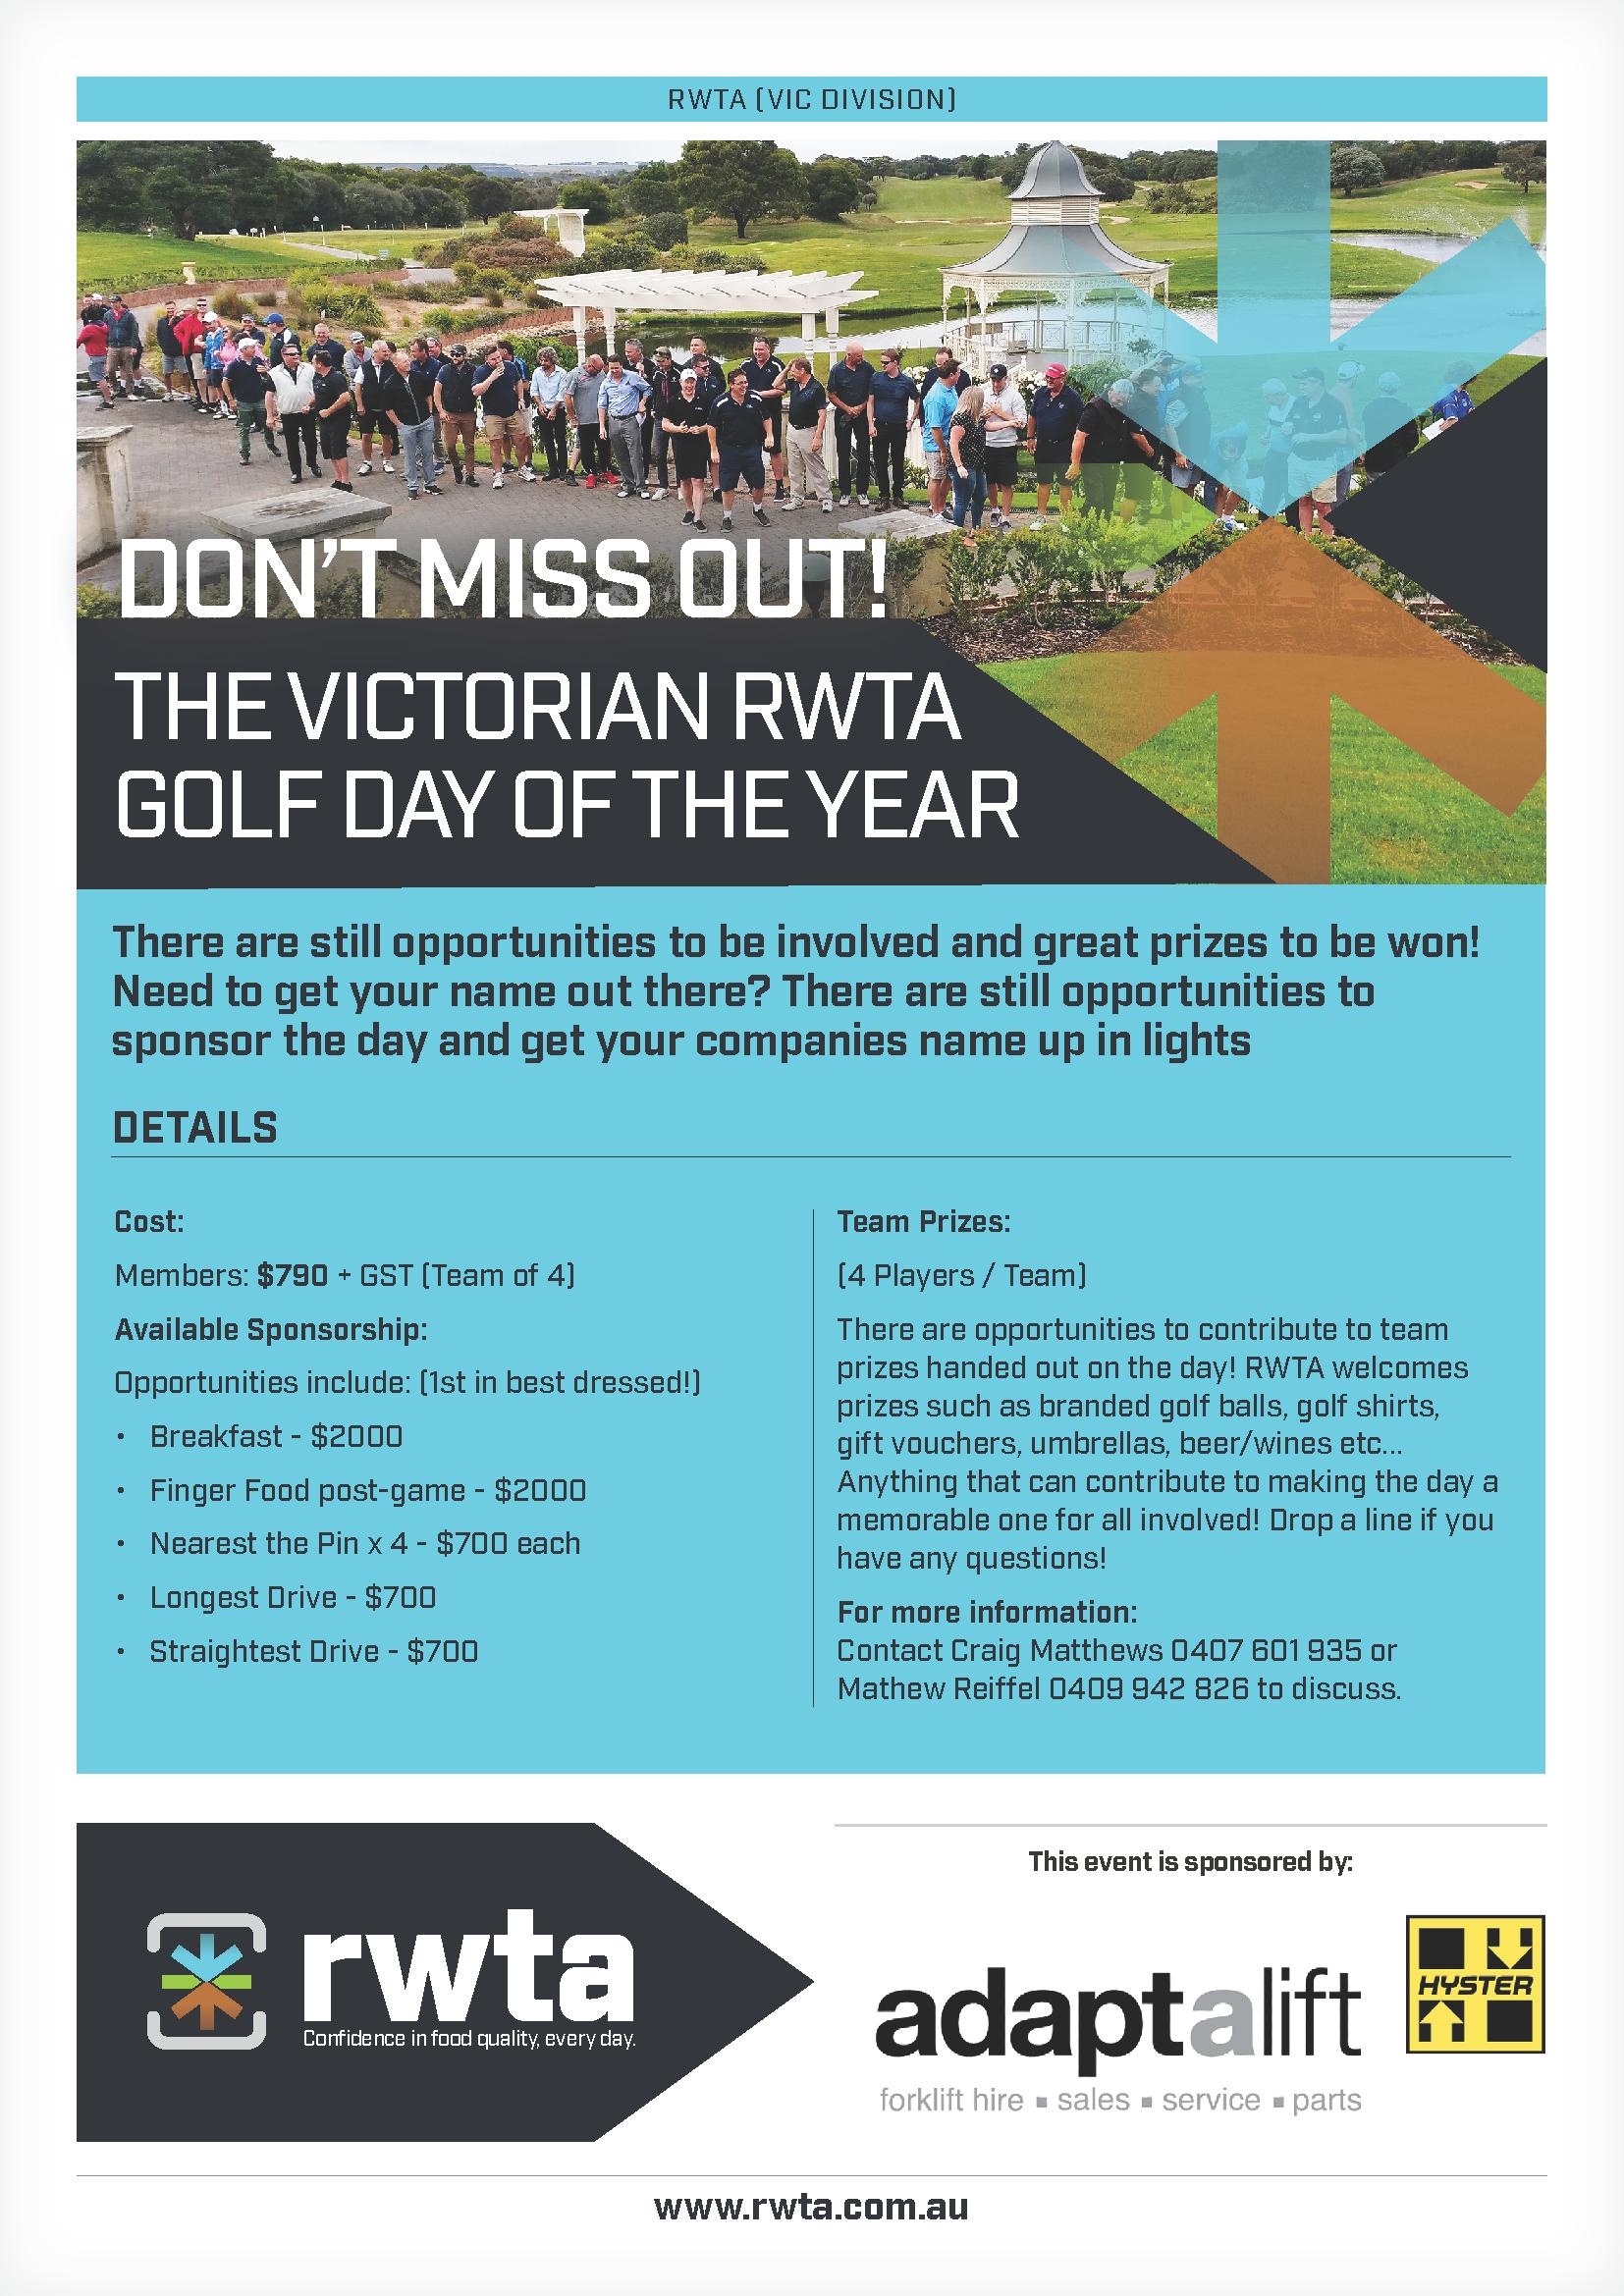 12613_RWTA_eB_VIC Golf Day_V3_01.png